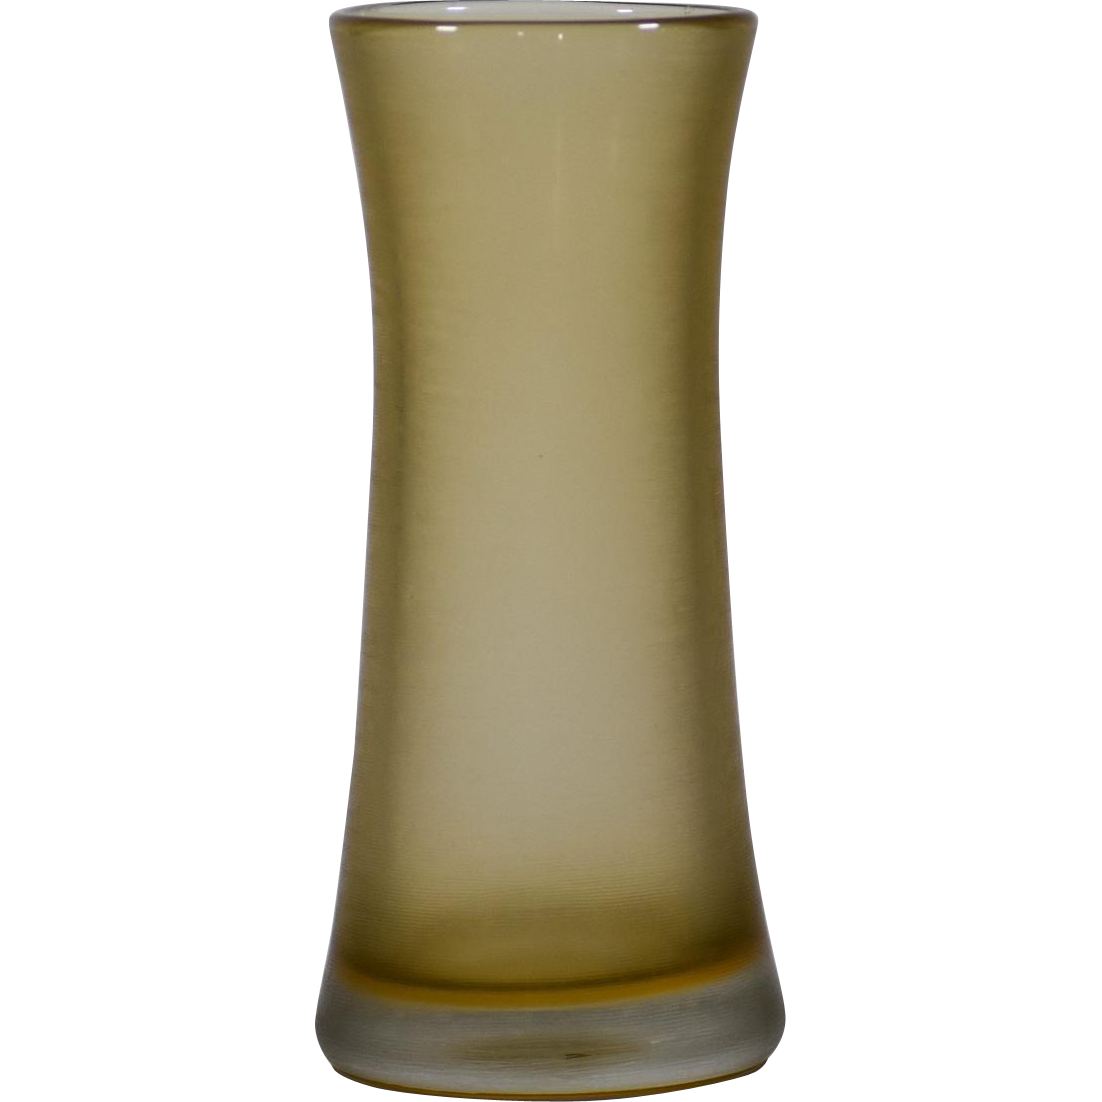 Venini Art Glass Vase Inciso c. 1965